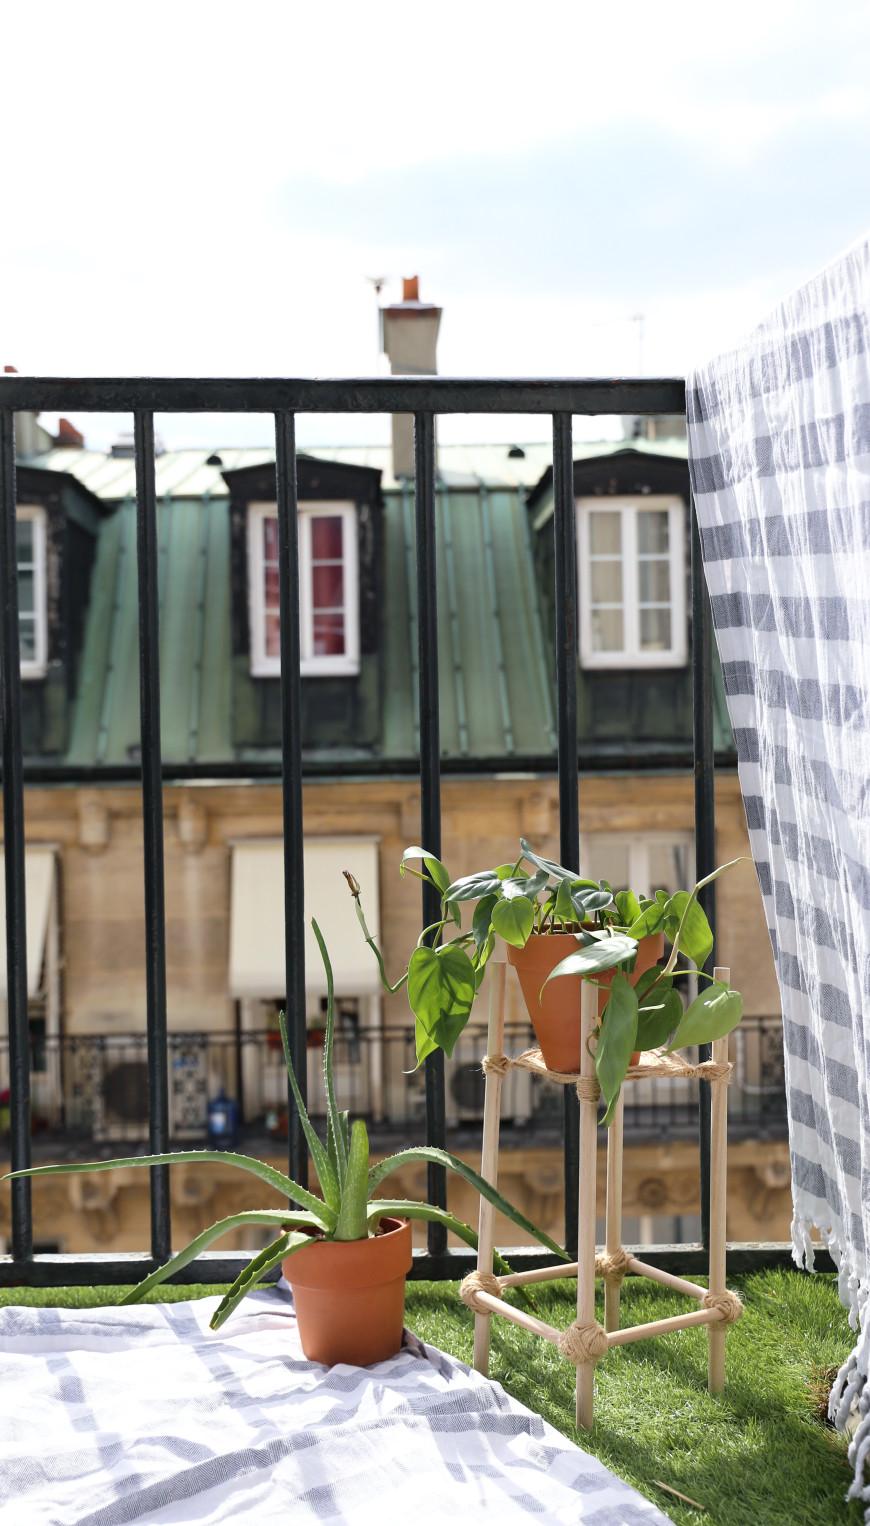 diy porte plante boheme mademoiselle claudine le blog. Black Bedroom Furniture Sets. Home Design Ideas